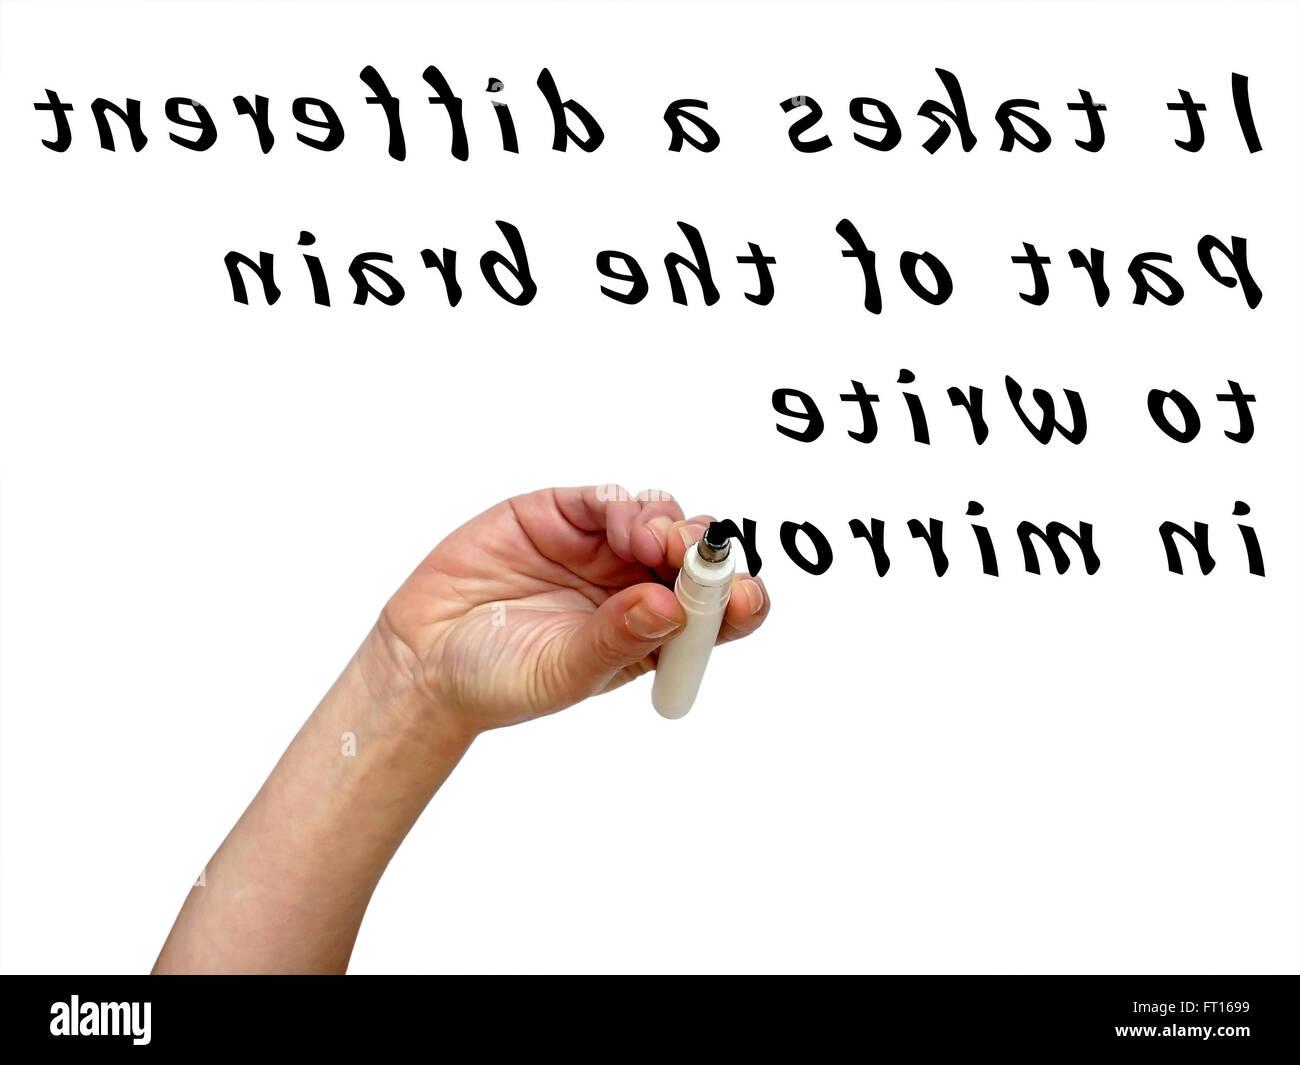 code writing upside down Write upside down - uʍop ǝpısdn ǝʇıɹʍ - facebook, whatsapp, twitter, instagram, snapchat, youtube, blog.